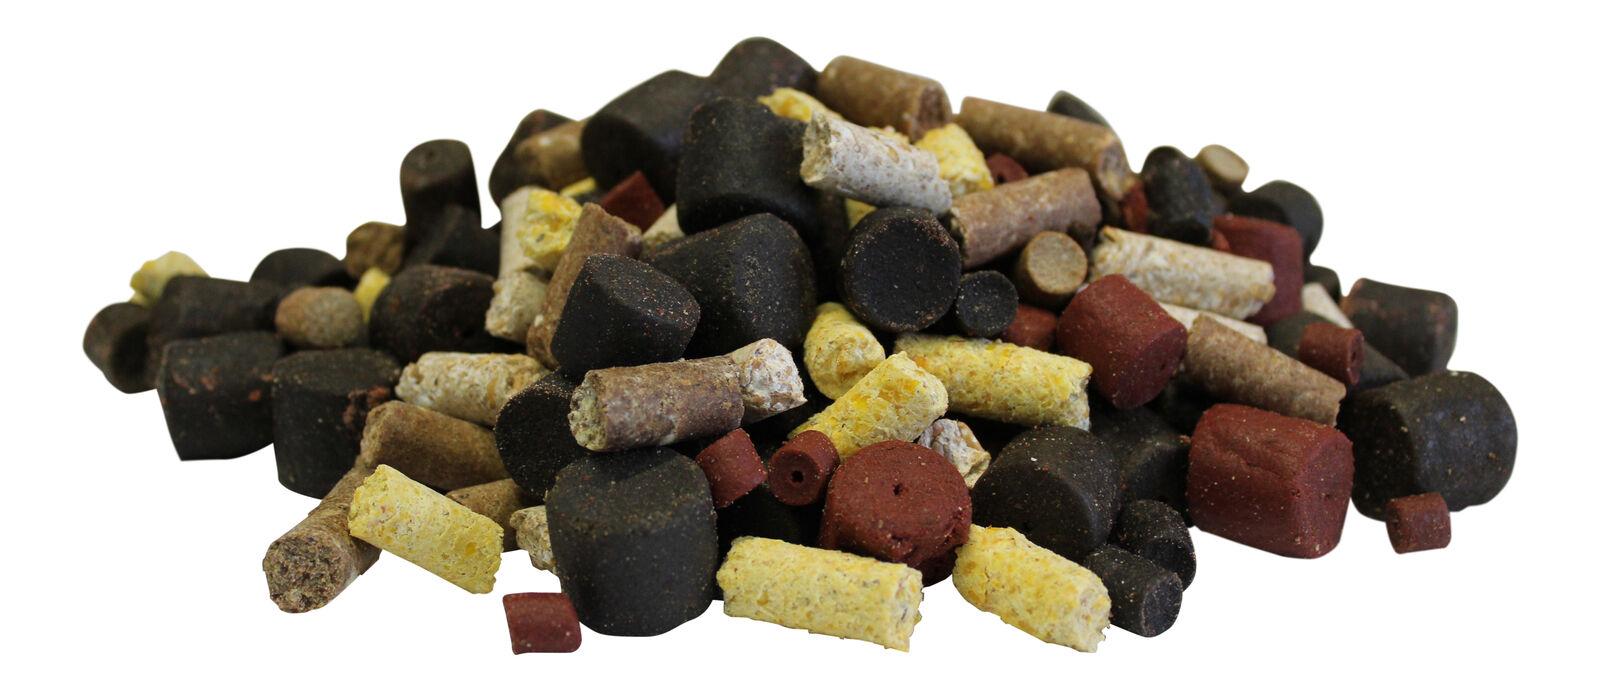 3,00 EUR  kg fletán & Alimentación PELLET MIX 10kg Hipogloso pellets